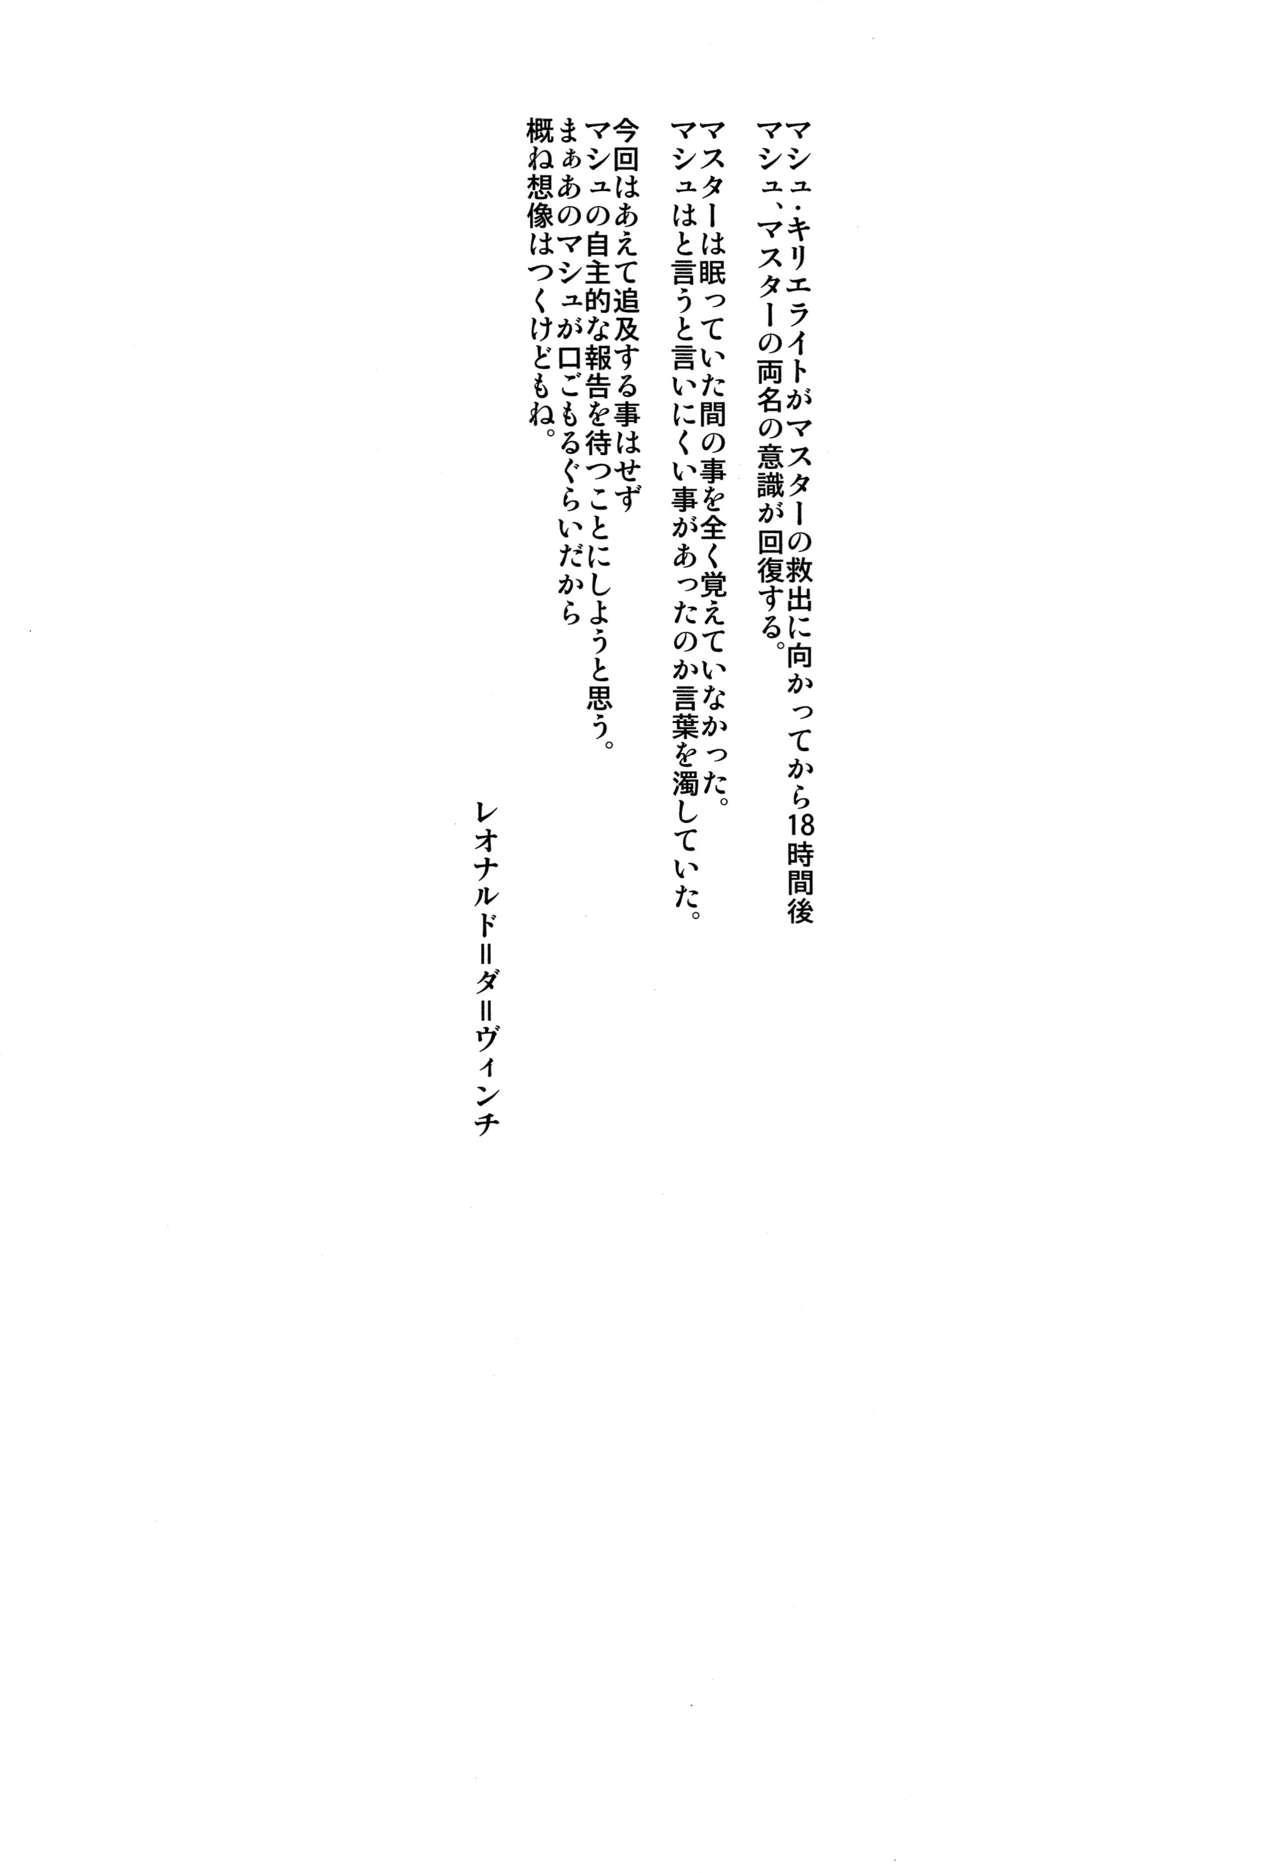 Yume yori Suteki na WonderLand 20